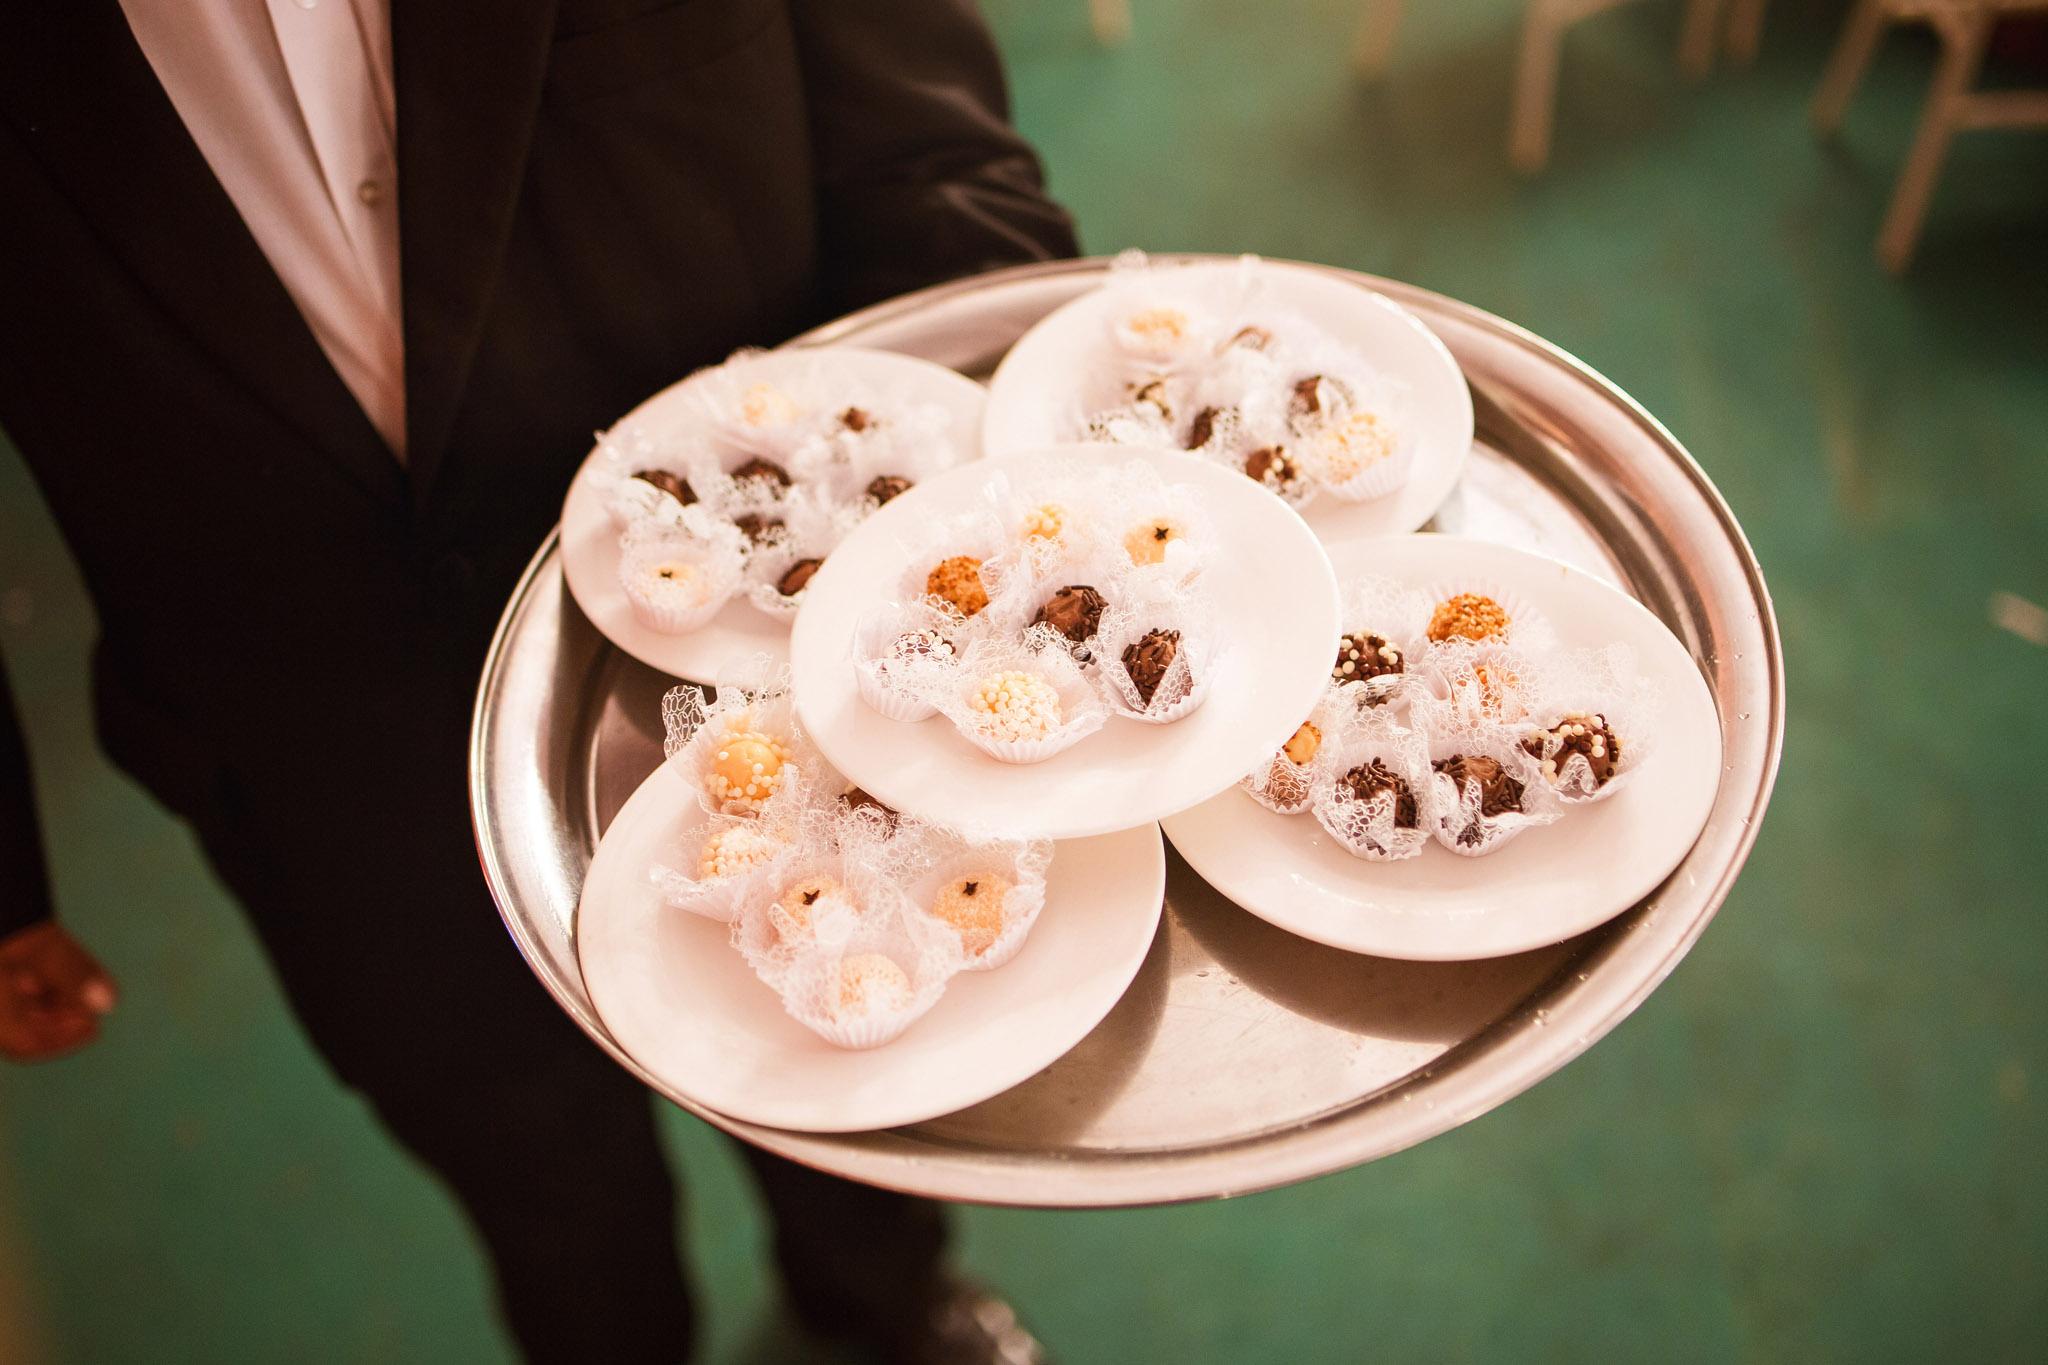 destination-wedding-food-brazil-paraguay